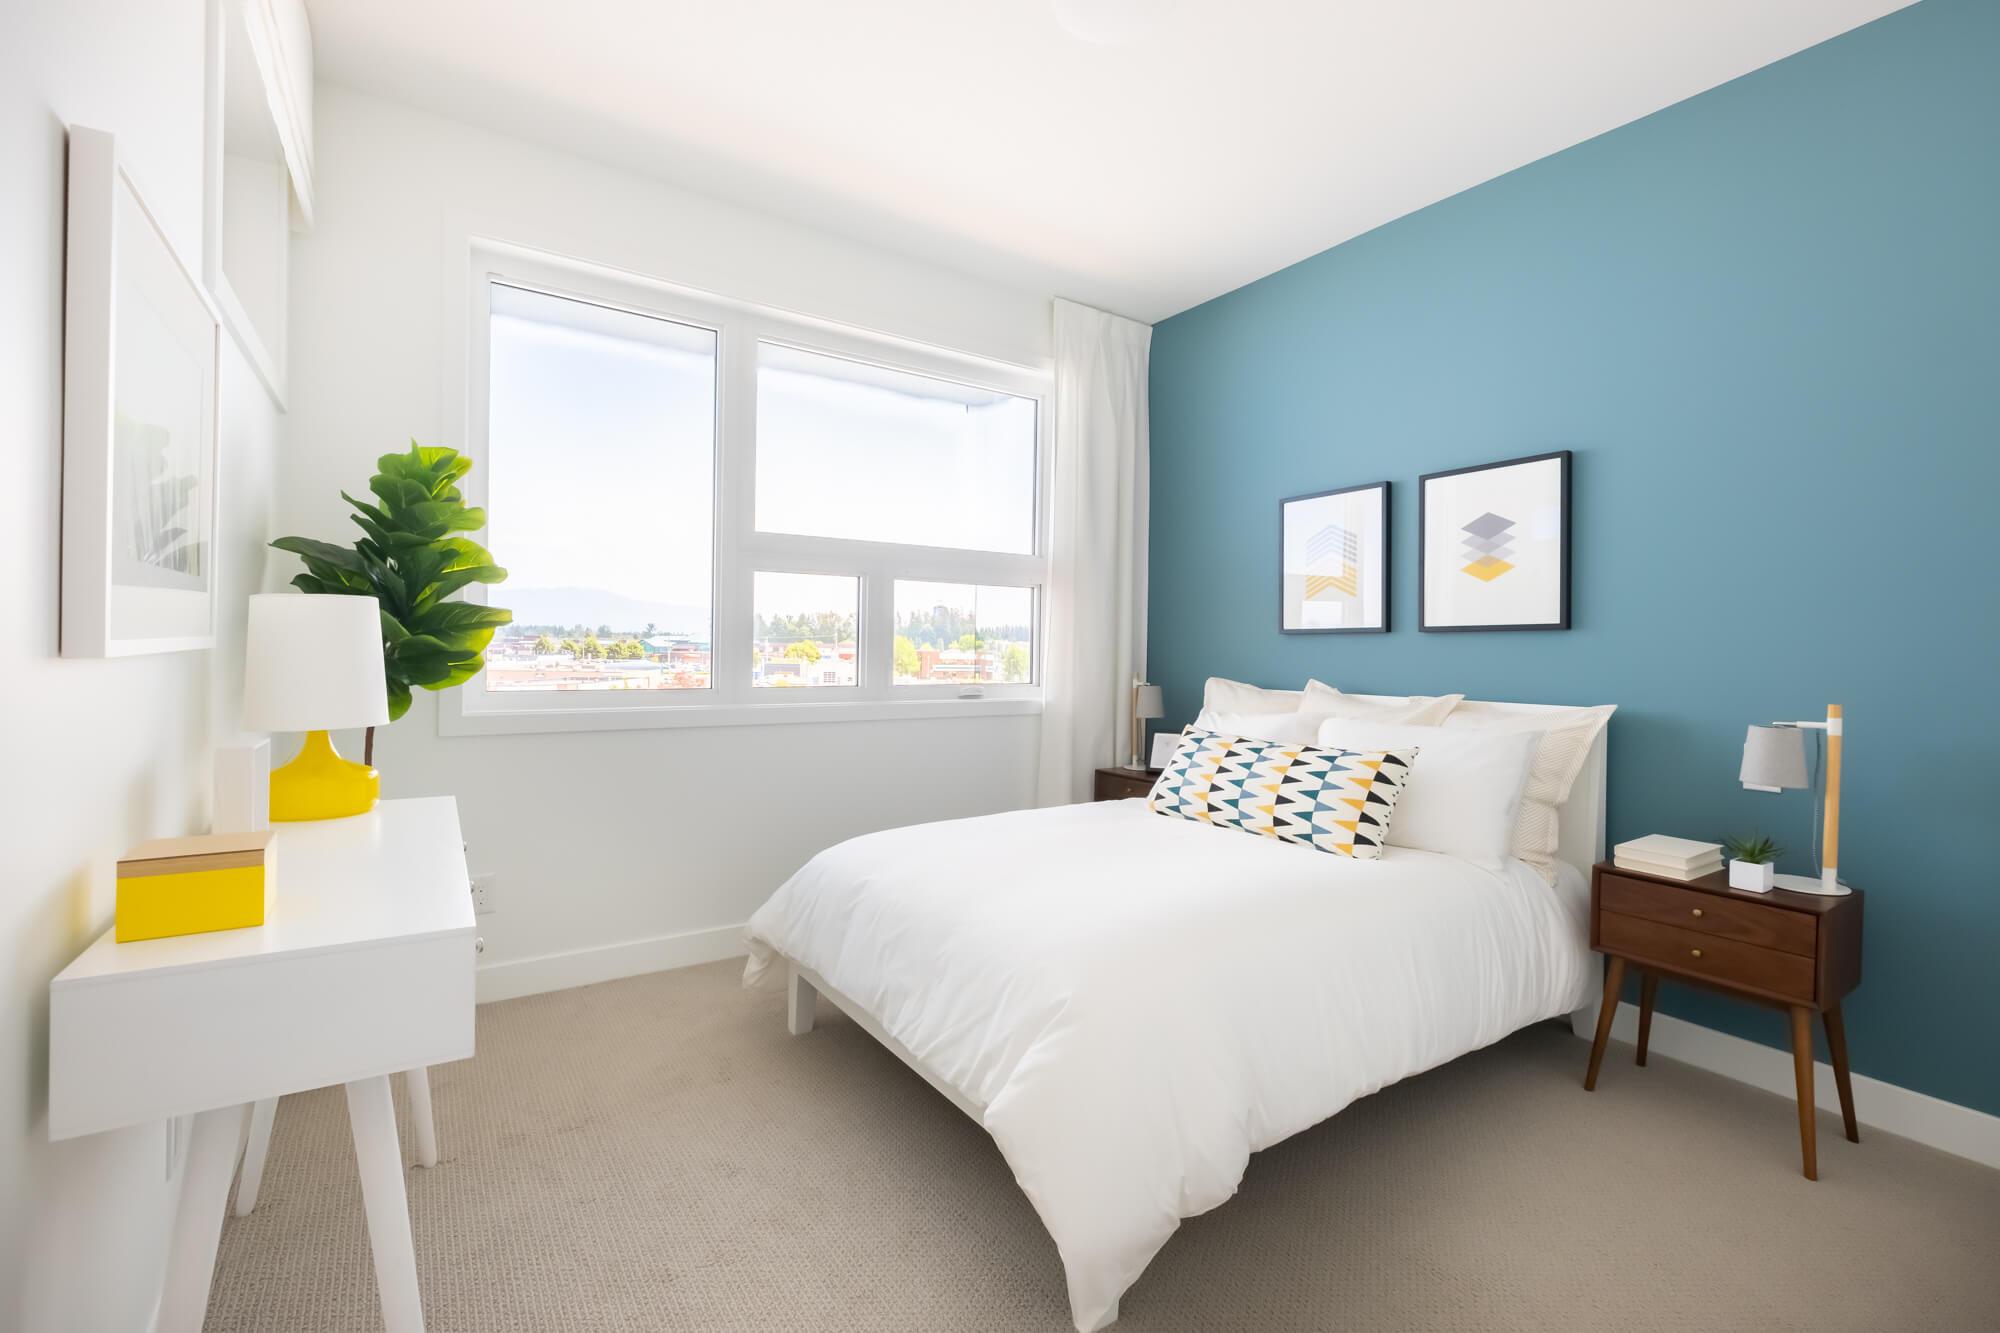 Bedroom - 2814 Gladwin Rd, Abbotsford, BC V2T 4S8, Canada!